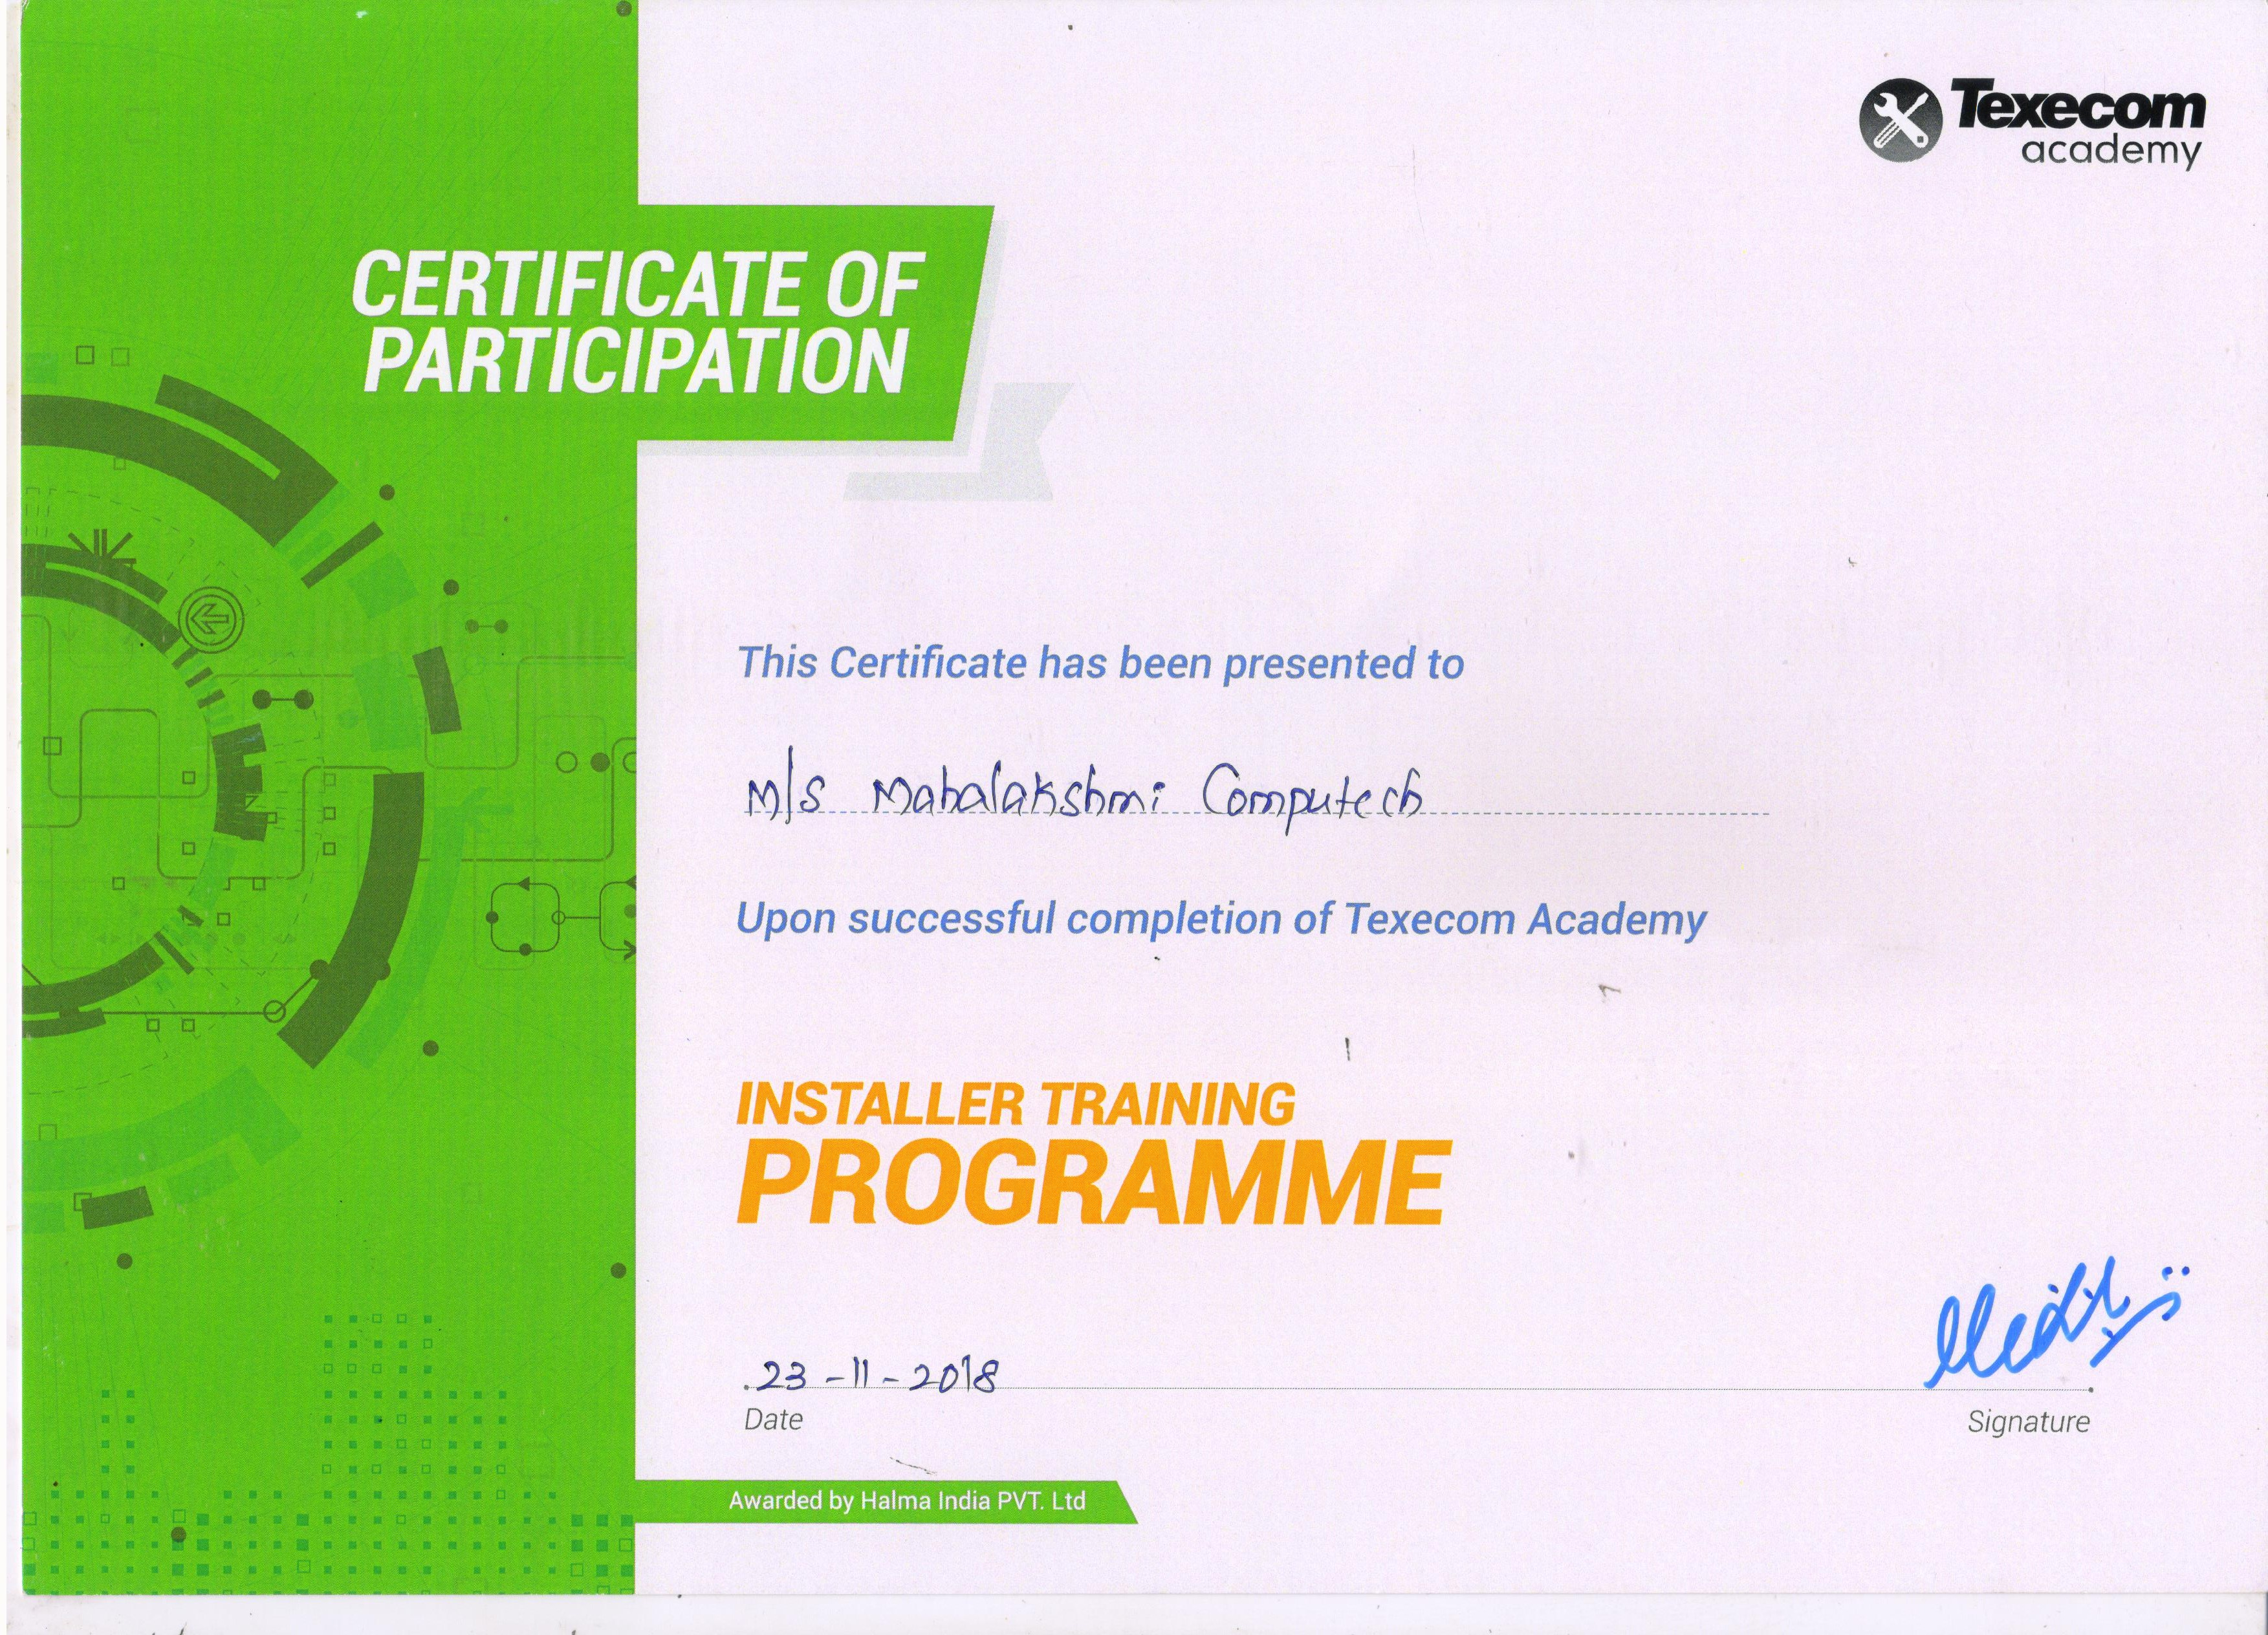 Texecom Certificate